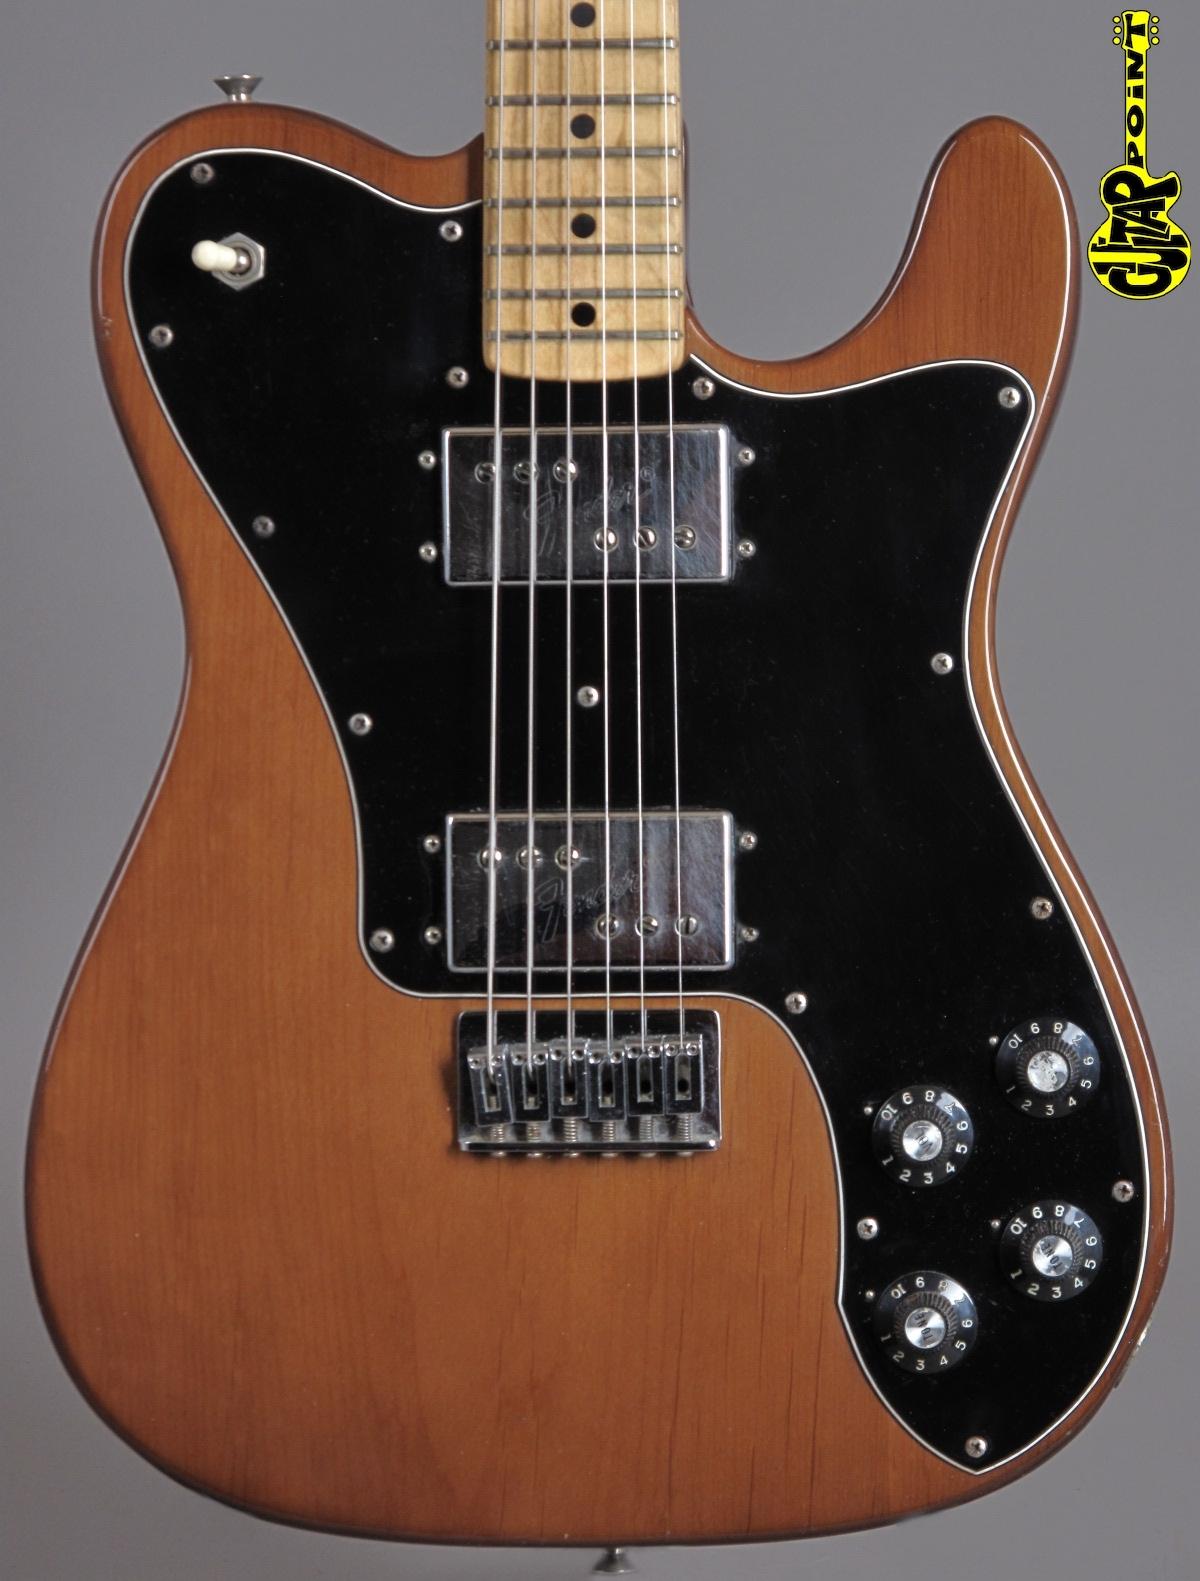 1973 Fender Telecaster DeLuxe - Mocca